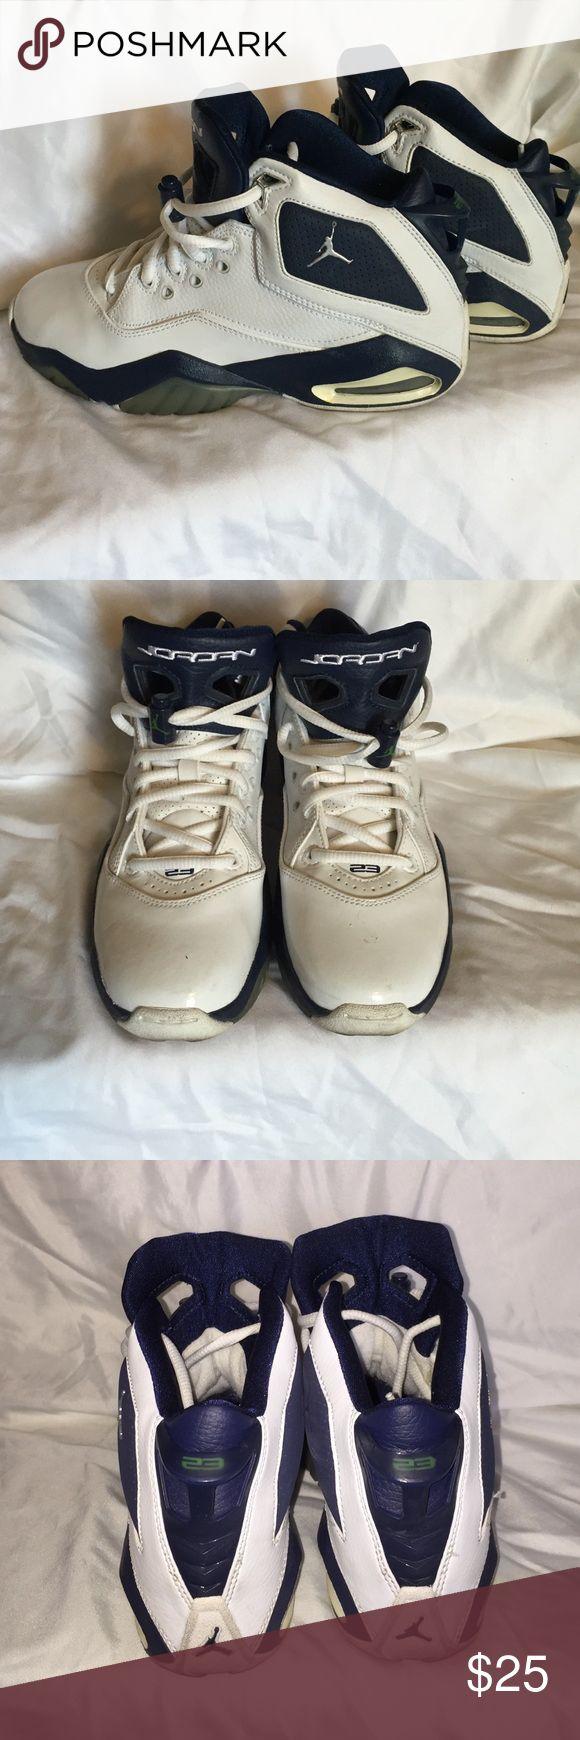 free shipping 0528d 5908b ... Shoes Sneakers  NIKE JORDAN BRAND, boys sneaker size 4.5Y